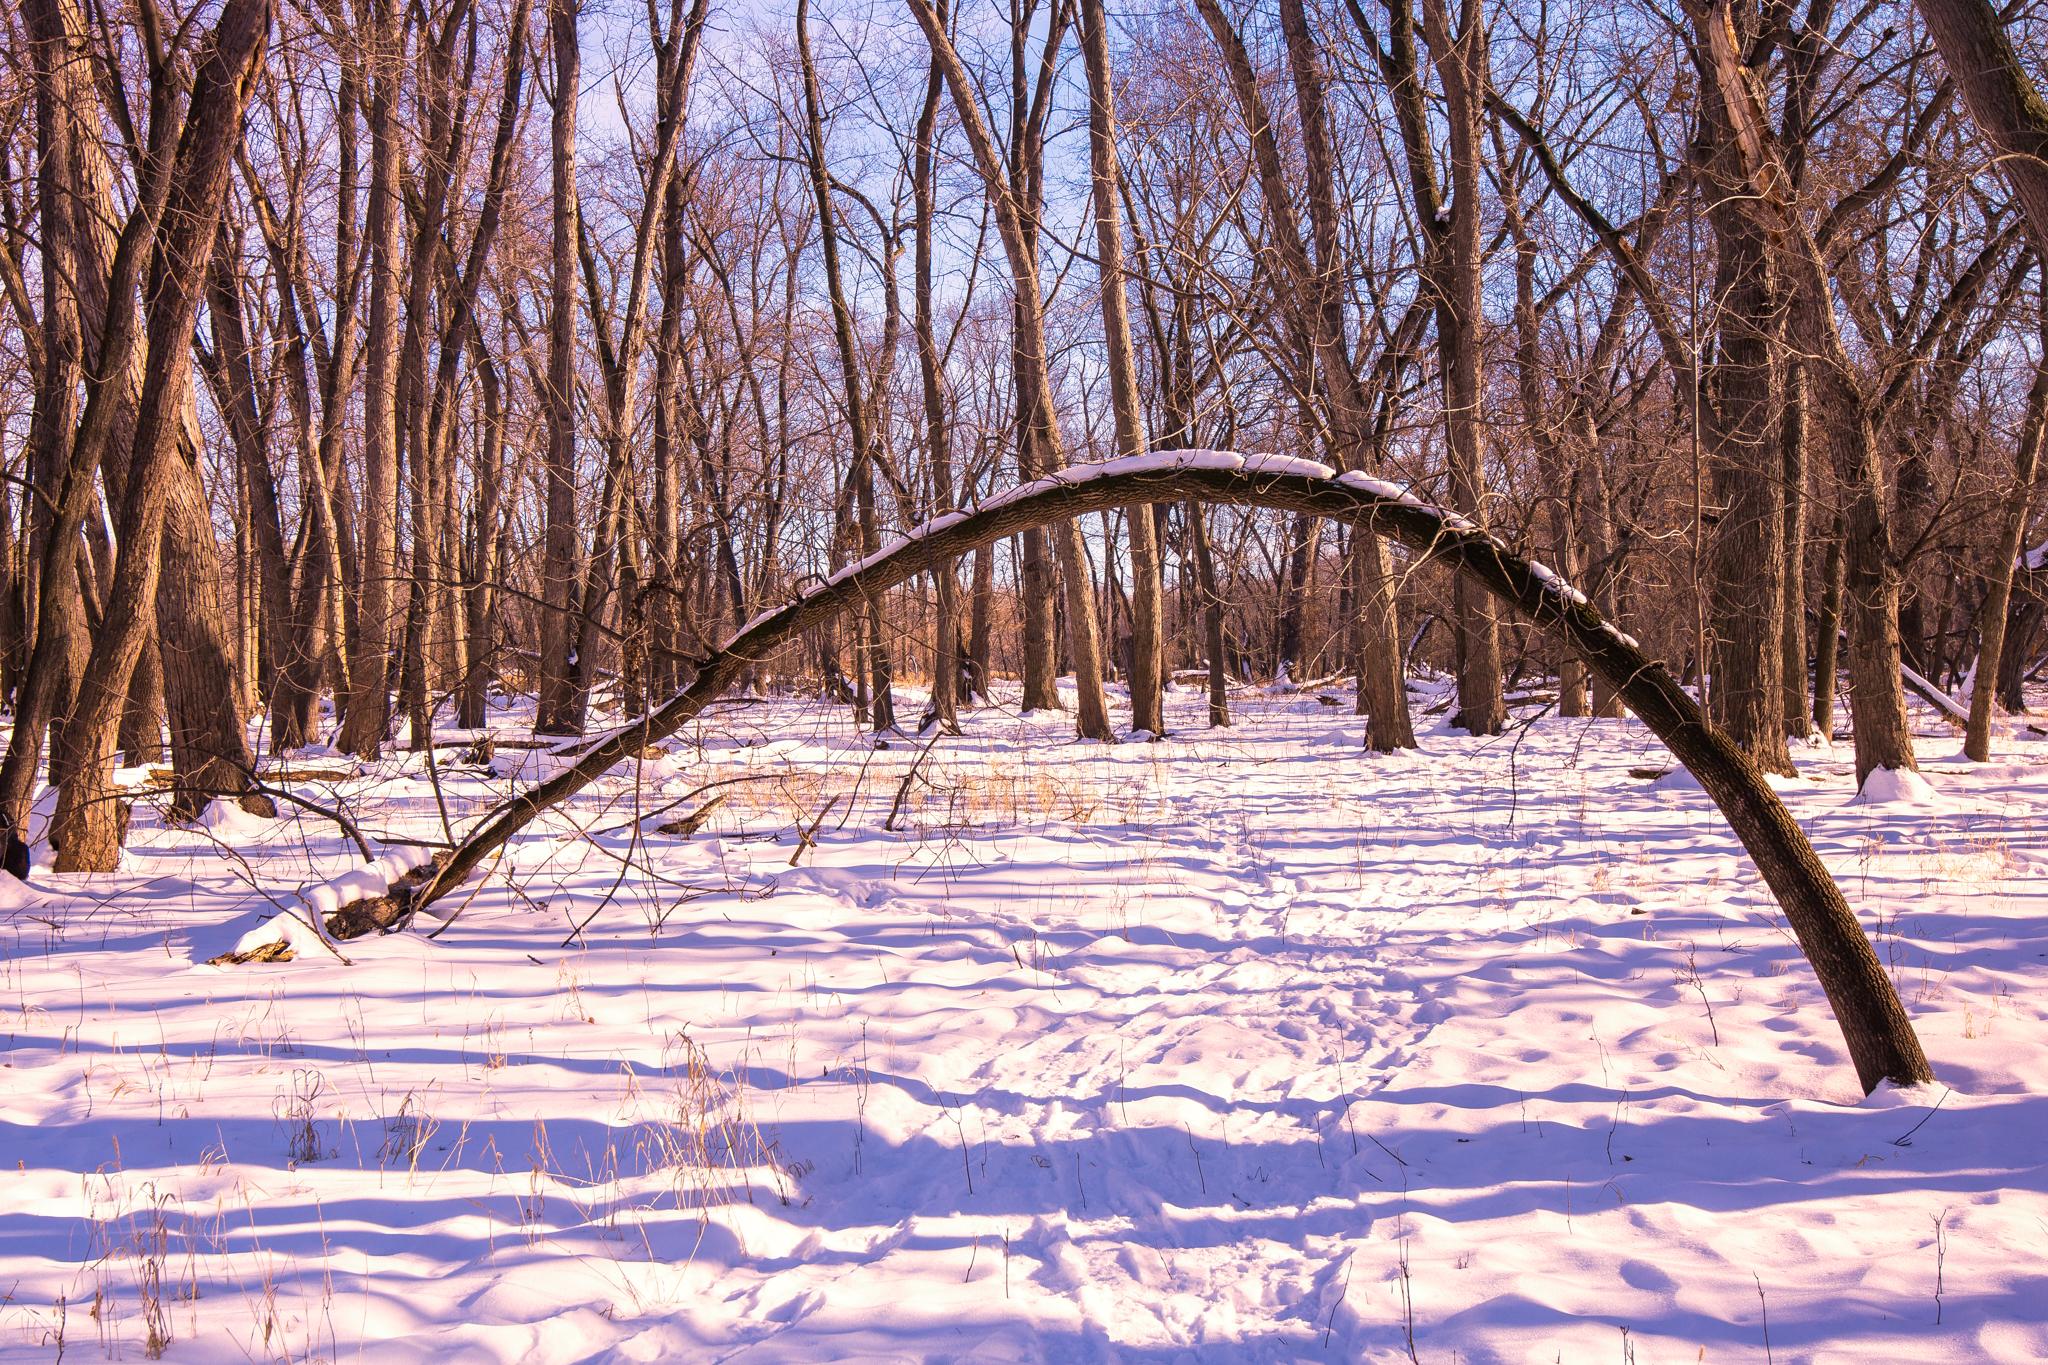 Winter's Arch